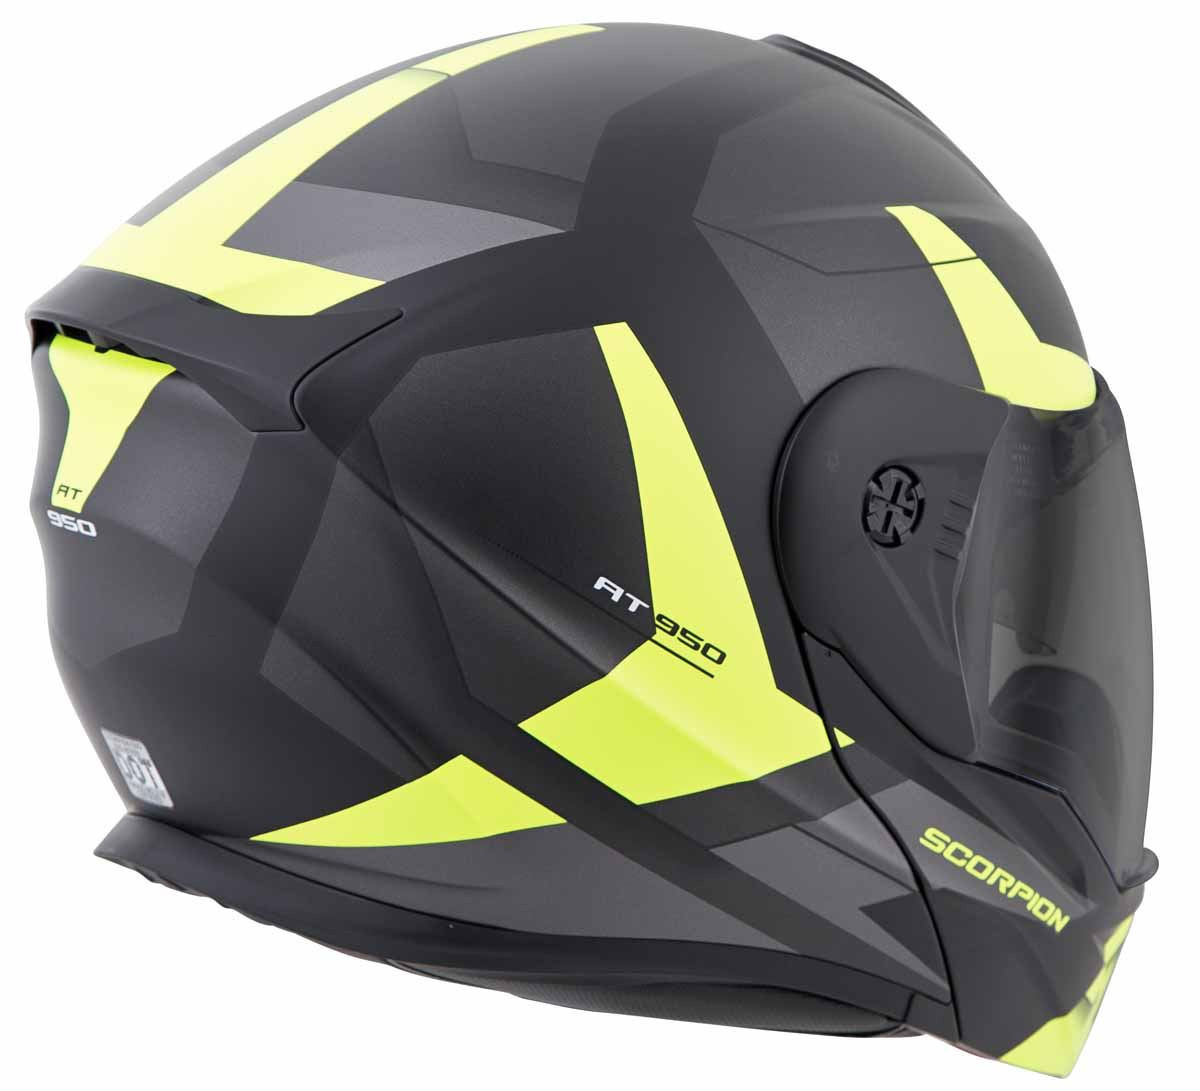 Scorpion-EXO-AT950-Helmet-Flip-Up-Modular-Dual-Sport-Adventure-ADV-DOT-XS-3XL miniature 40